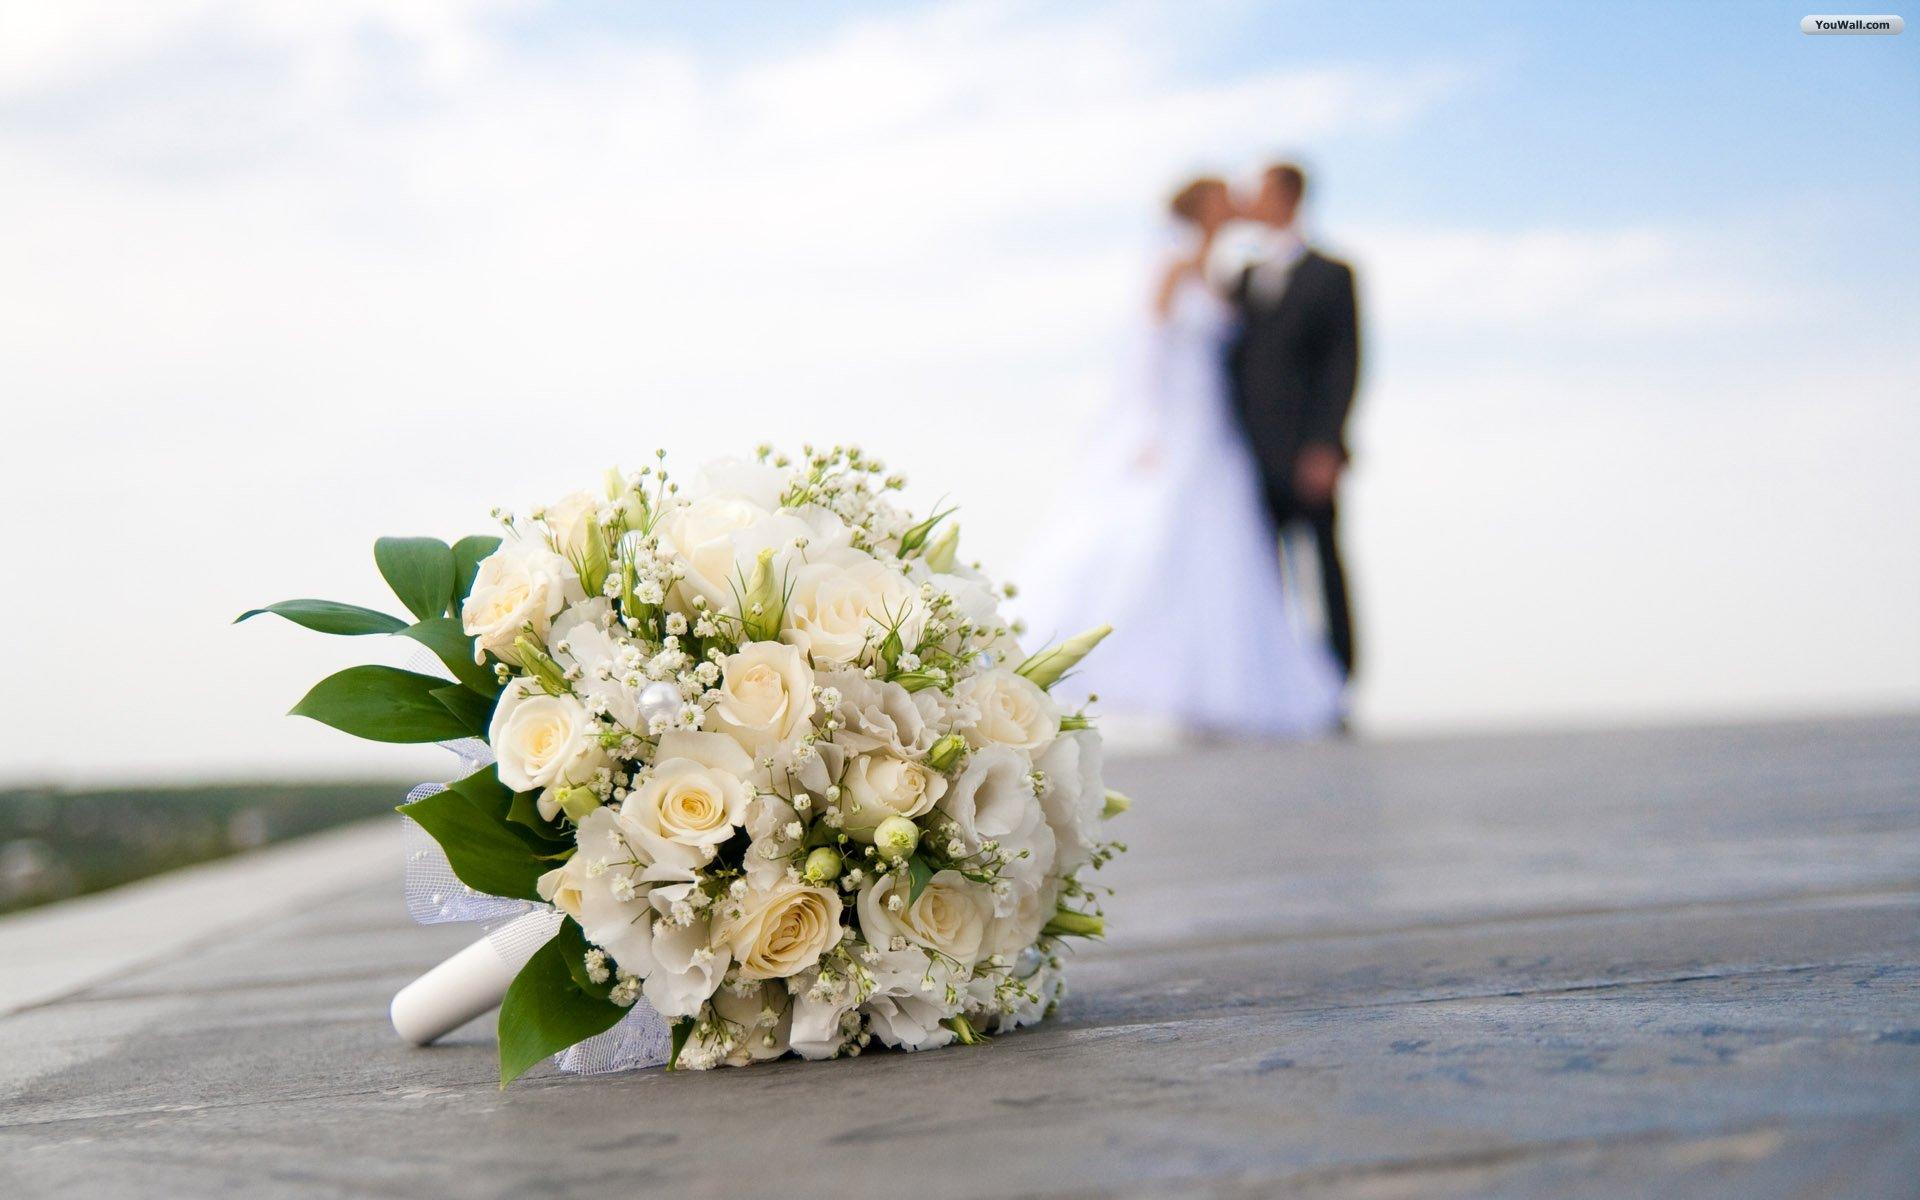 Luxury Resort In Malaysia, Malaysia Wedding, Destination Wedding, Tanjung Rhu Malaysia